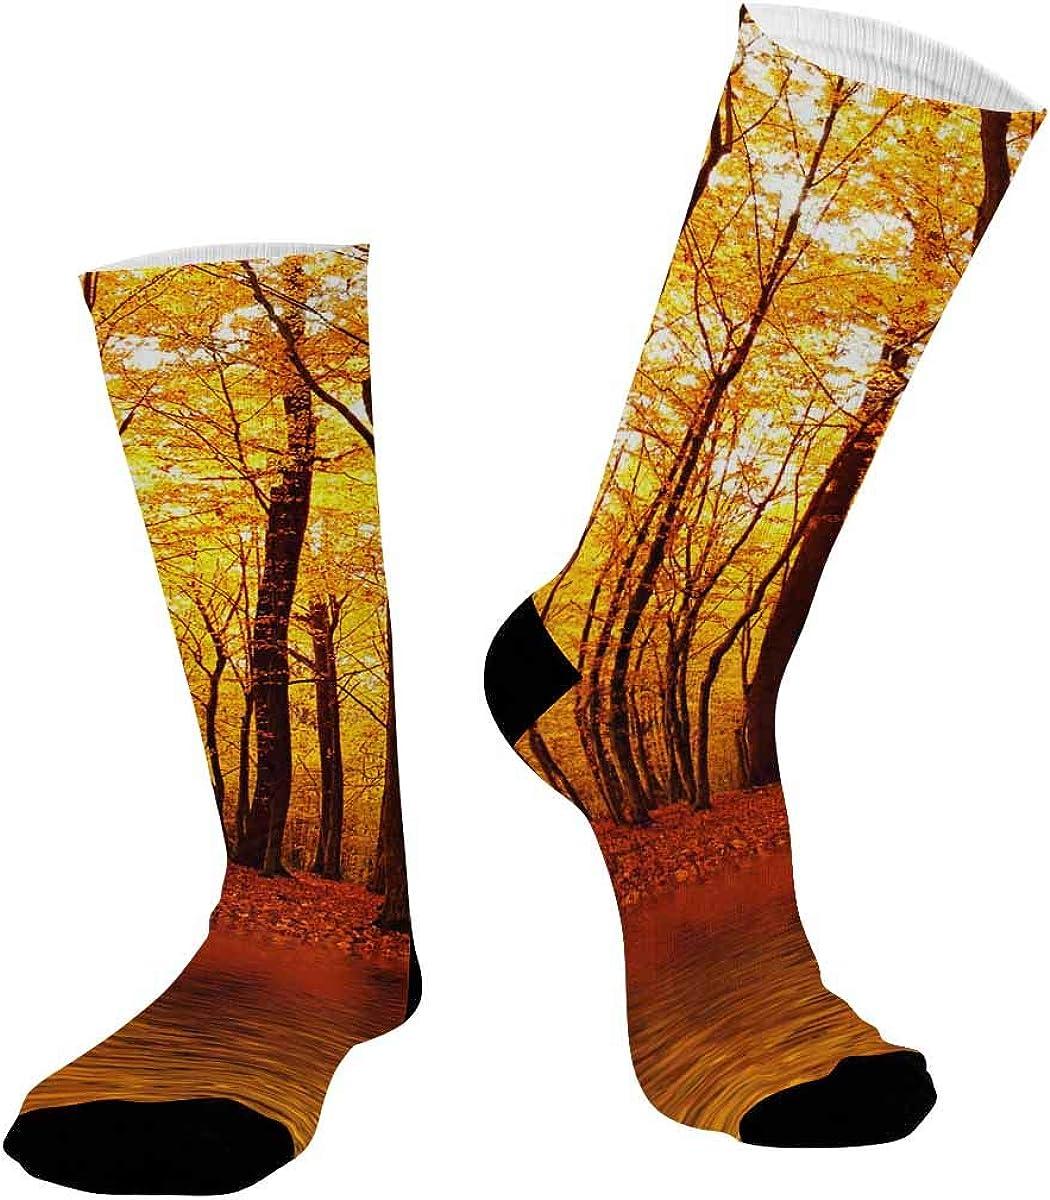 INTERESTPRINT Unisex Outdoor Sports Athletic Hiking Socks Autumn Forest Nature